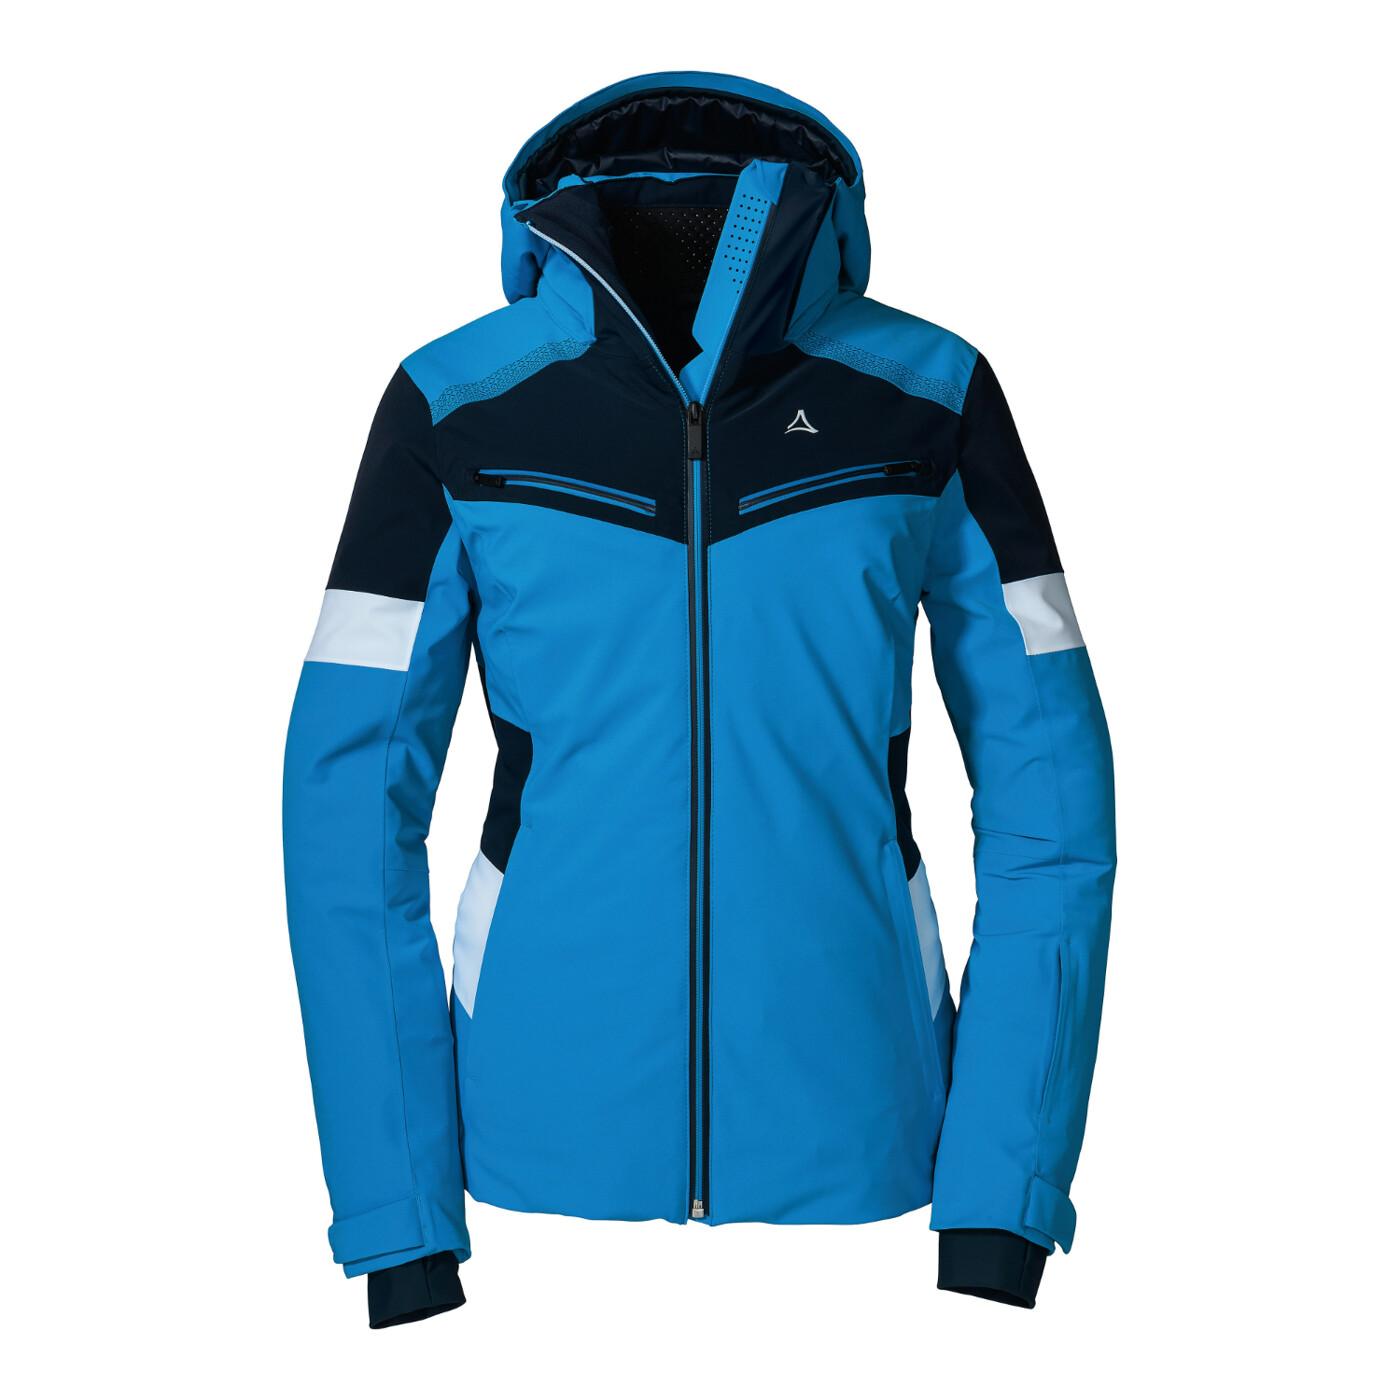 SCHÖFFEL Ski Jacket Paznaun L - Damen